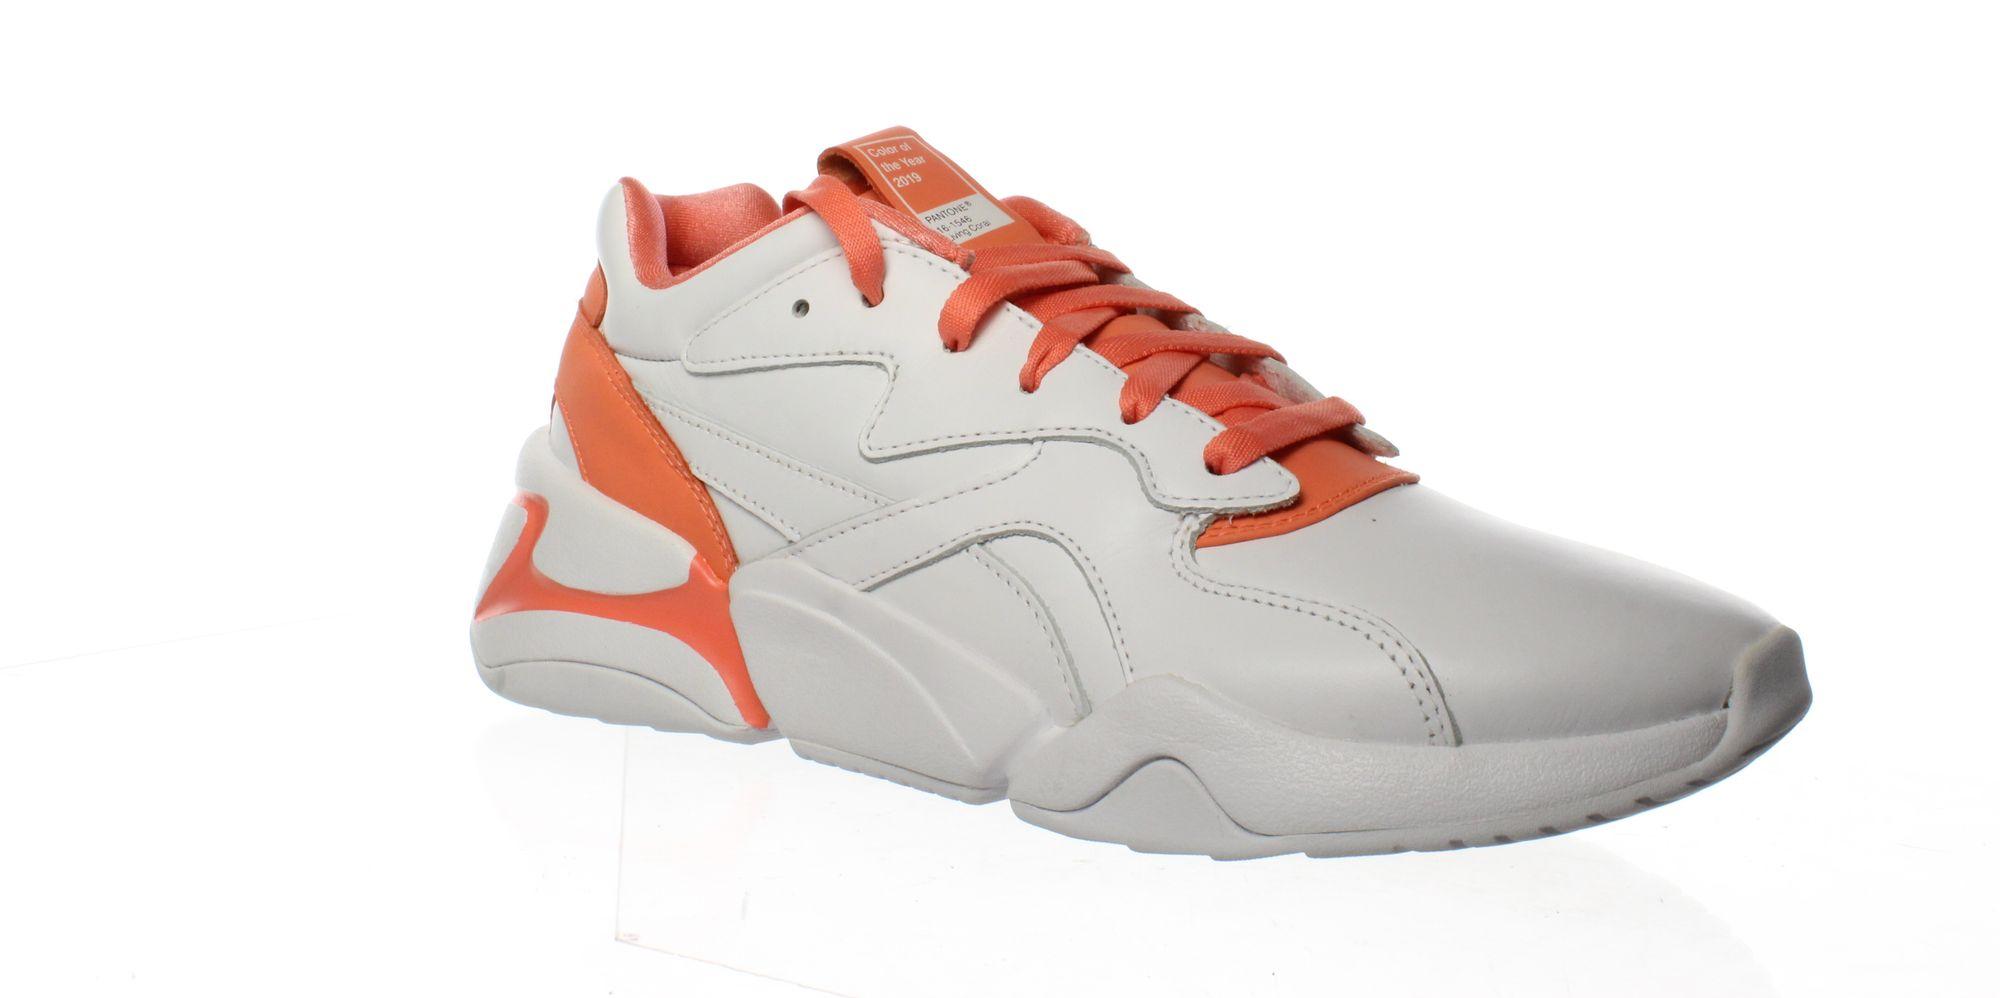 nova x pantone 2 women's sneakers